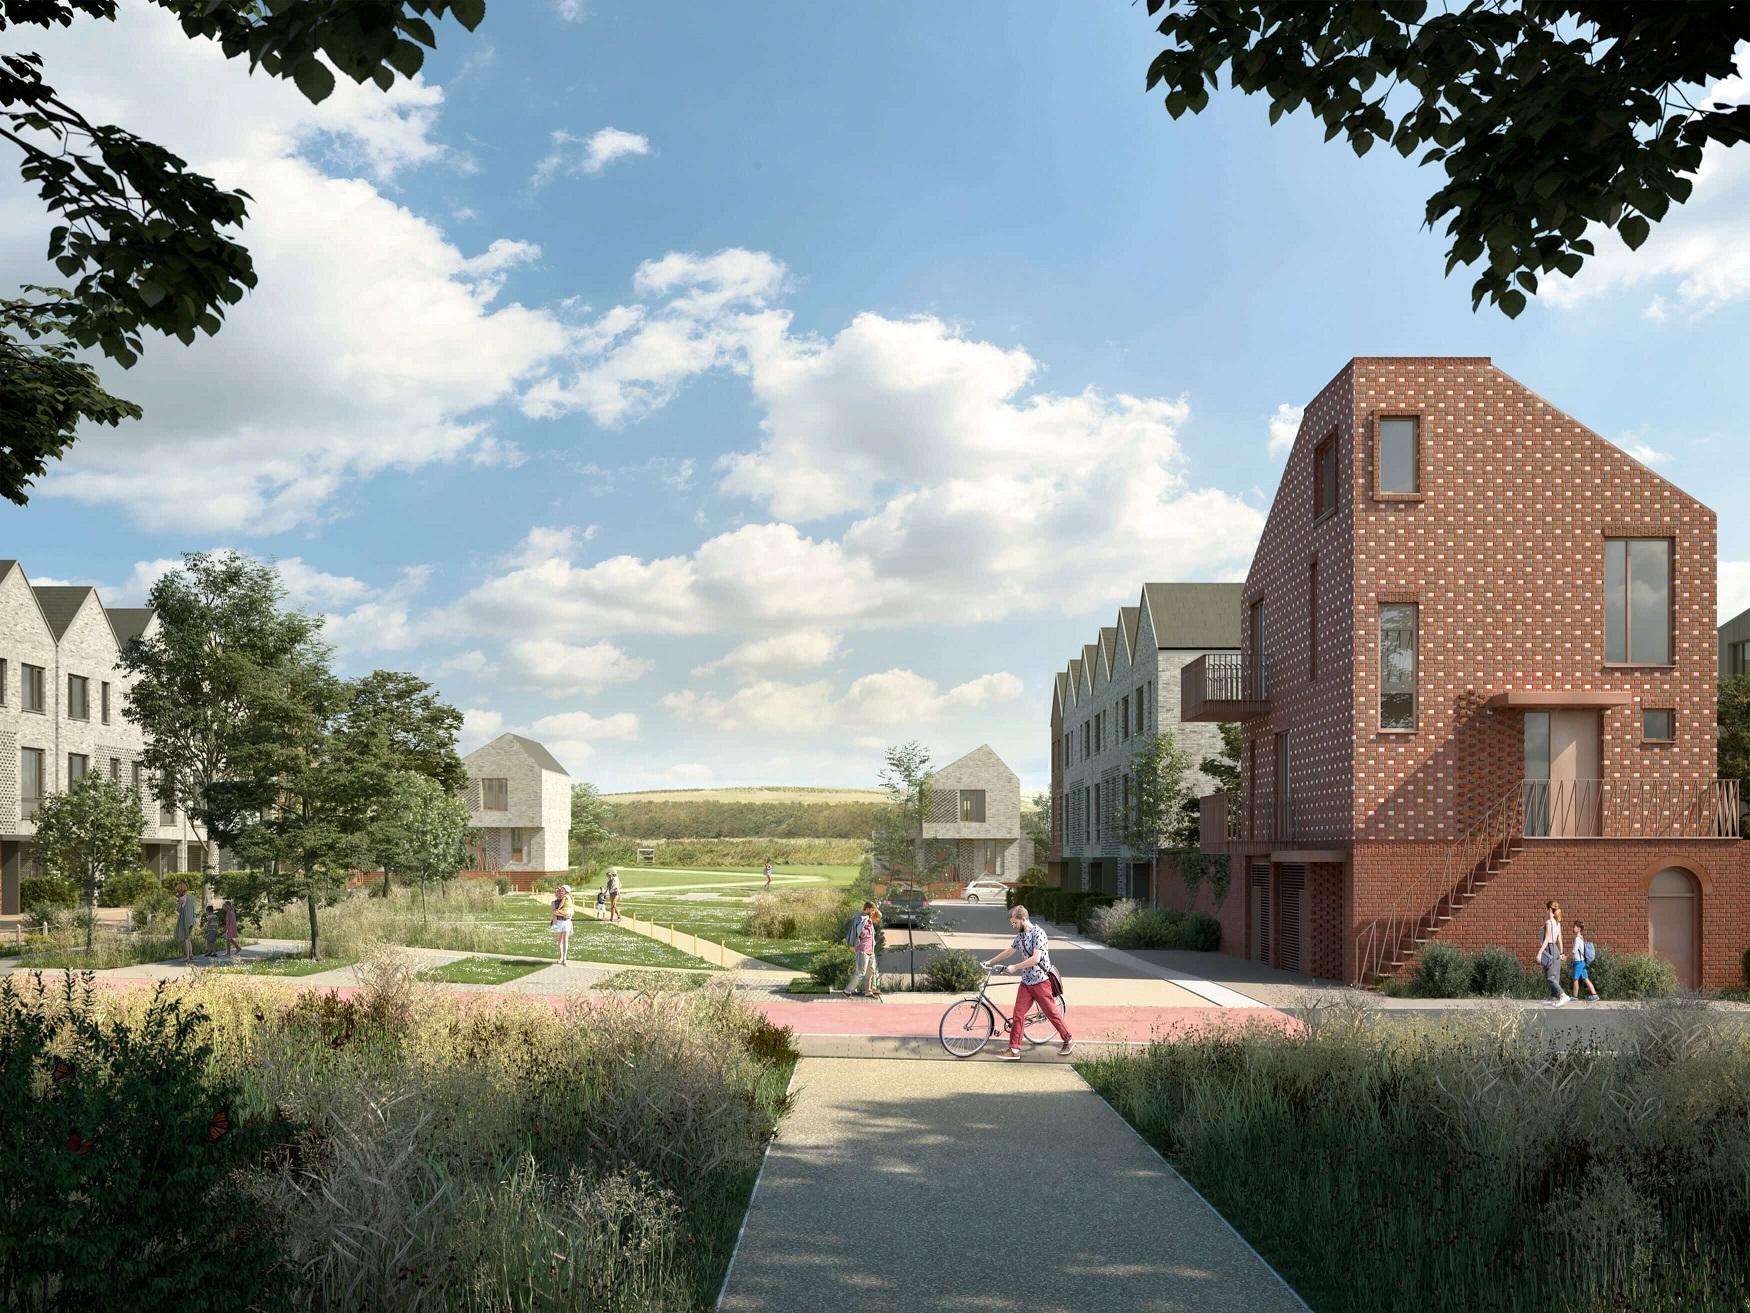 Image of proposed Bulverhythe Development